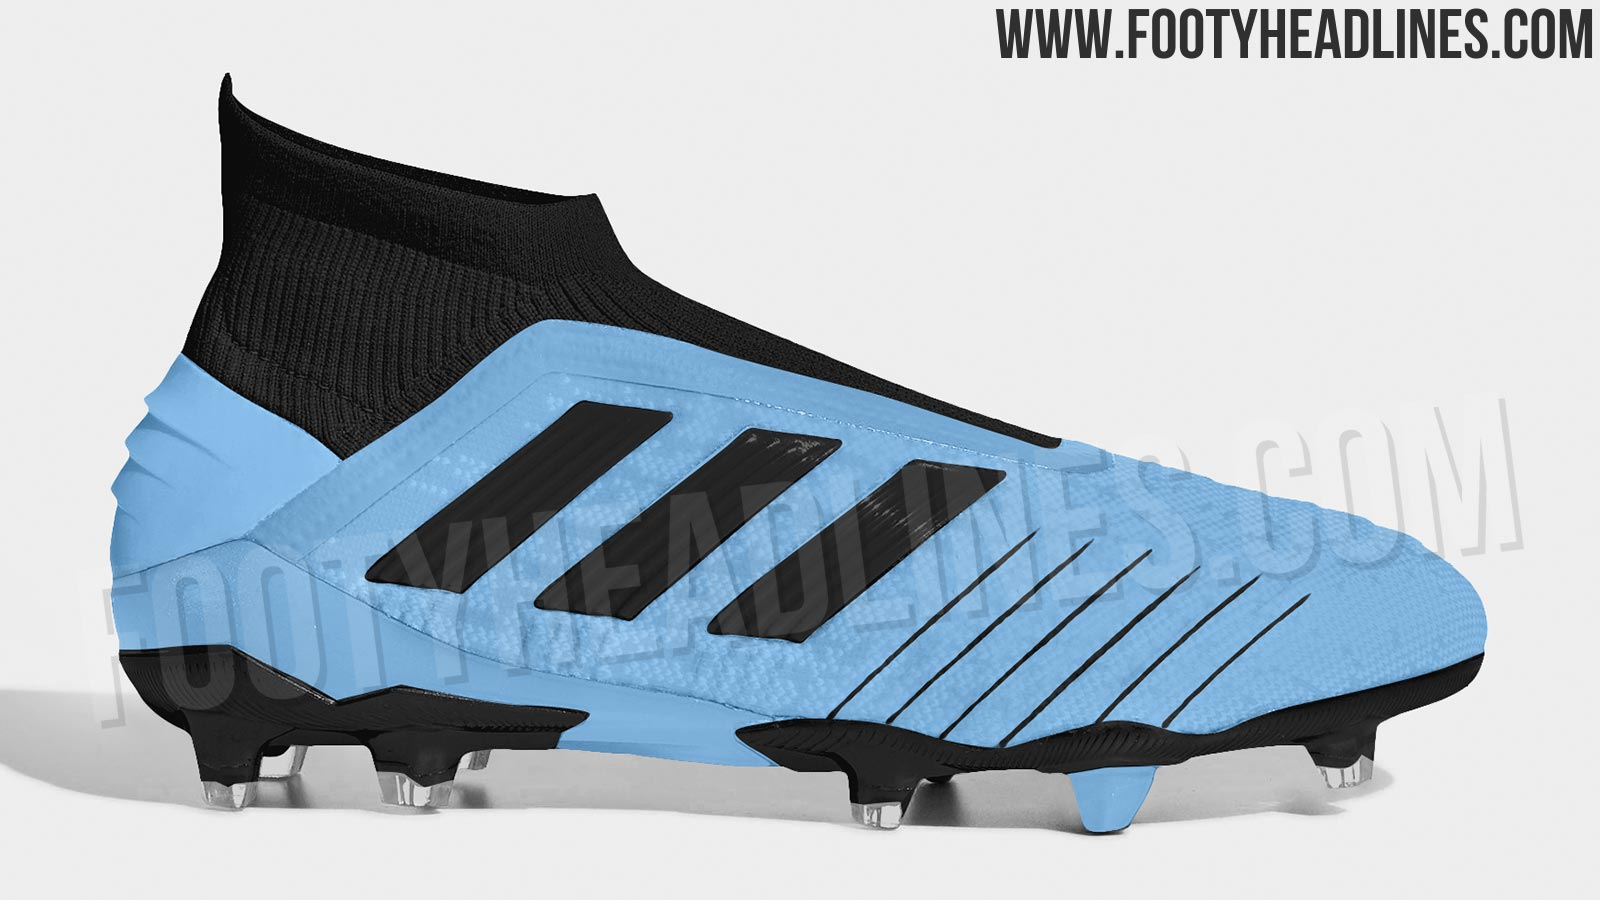 New Adidas Soccer Cleats 2020 Ft. Next Gen Nemeziz & X   Adidas 'New Season' 2019 20 Boots Pack